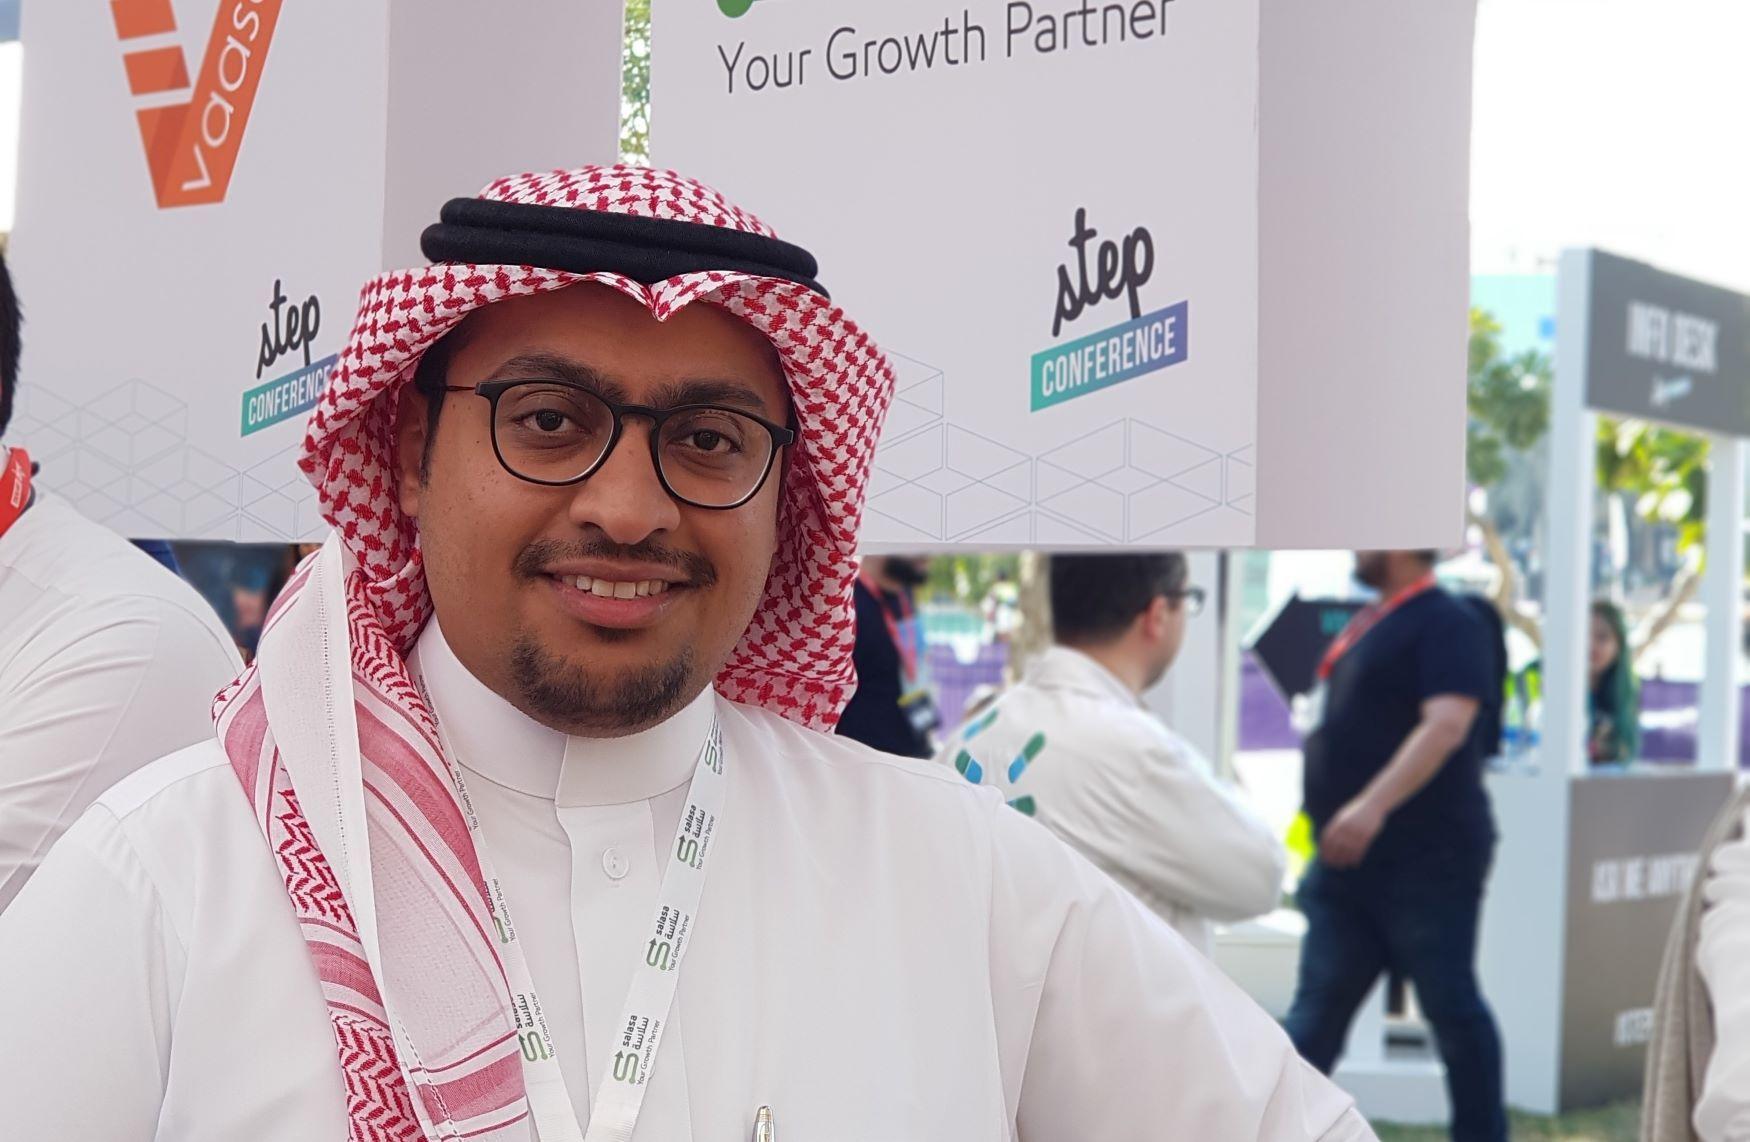 In conversation with Abdulmajeed Alyemni of KSA's Salasa